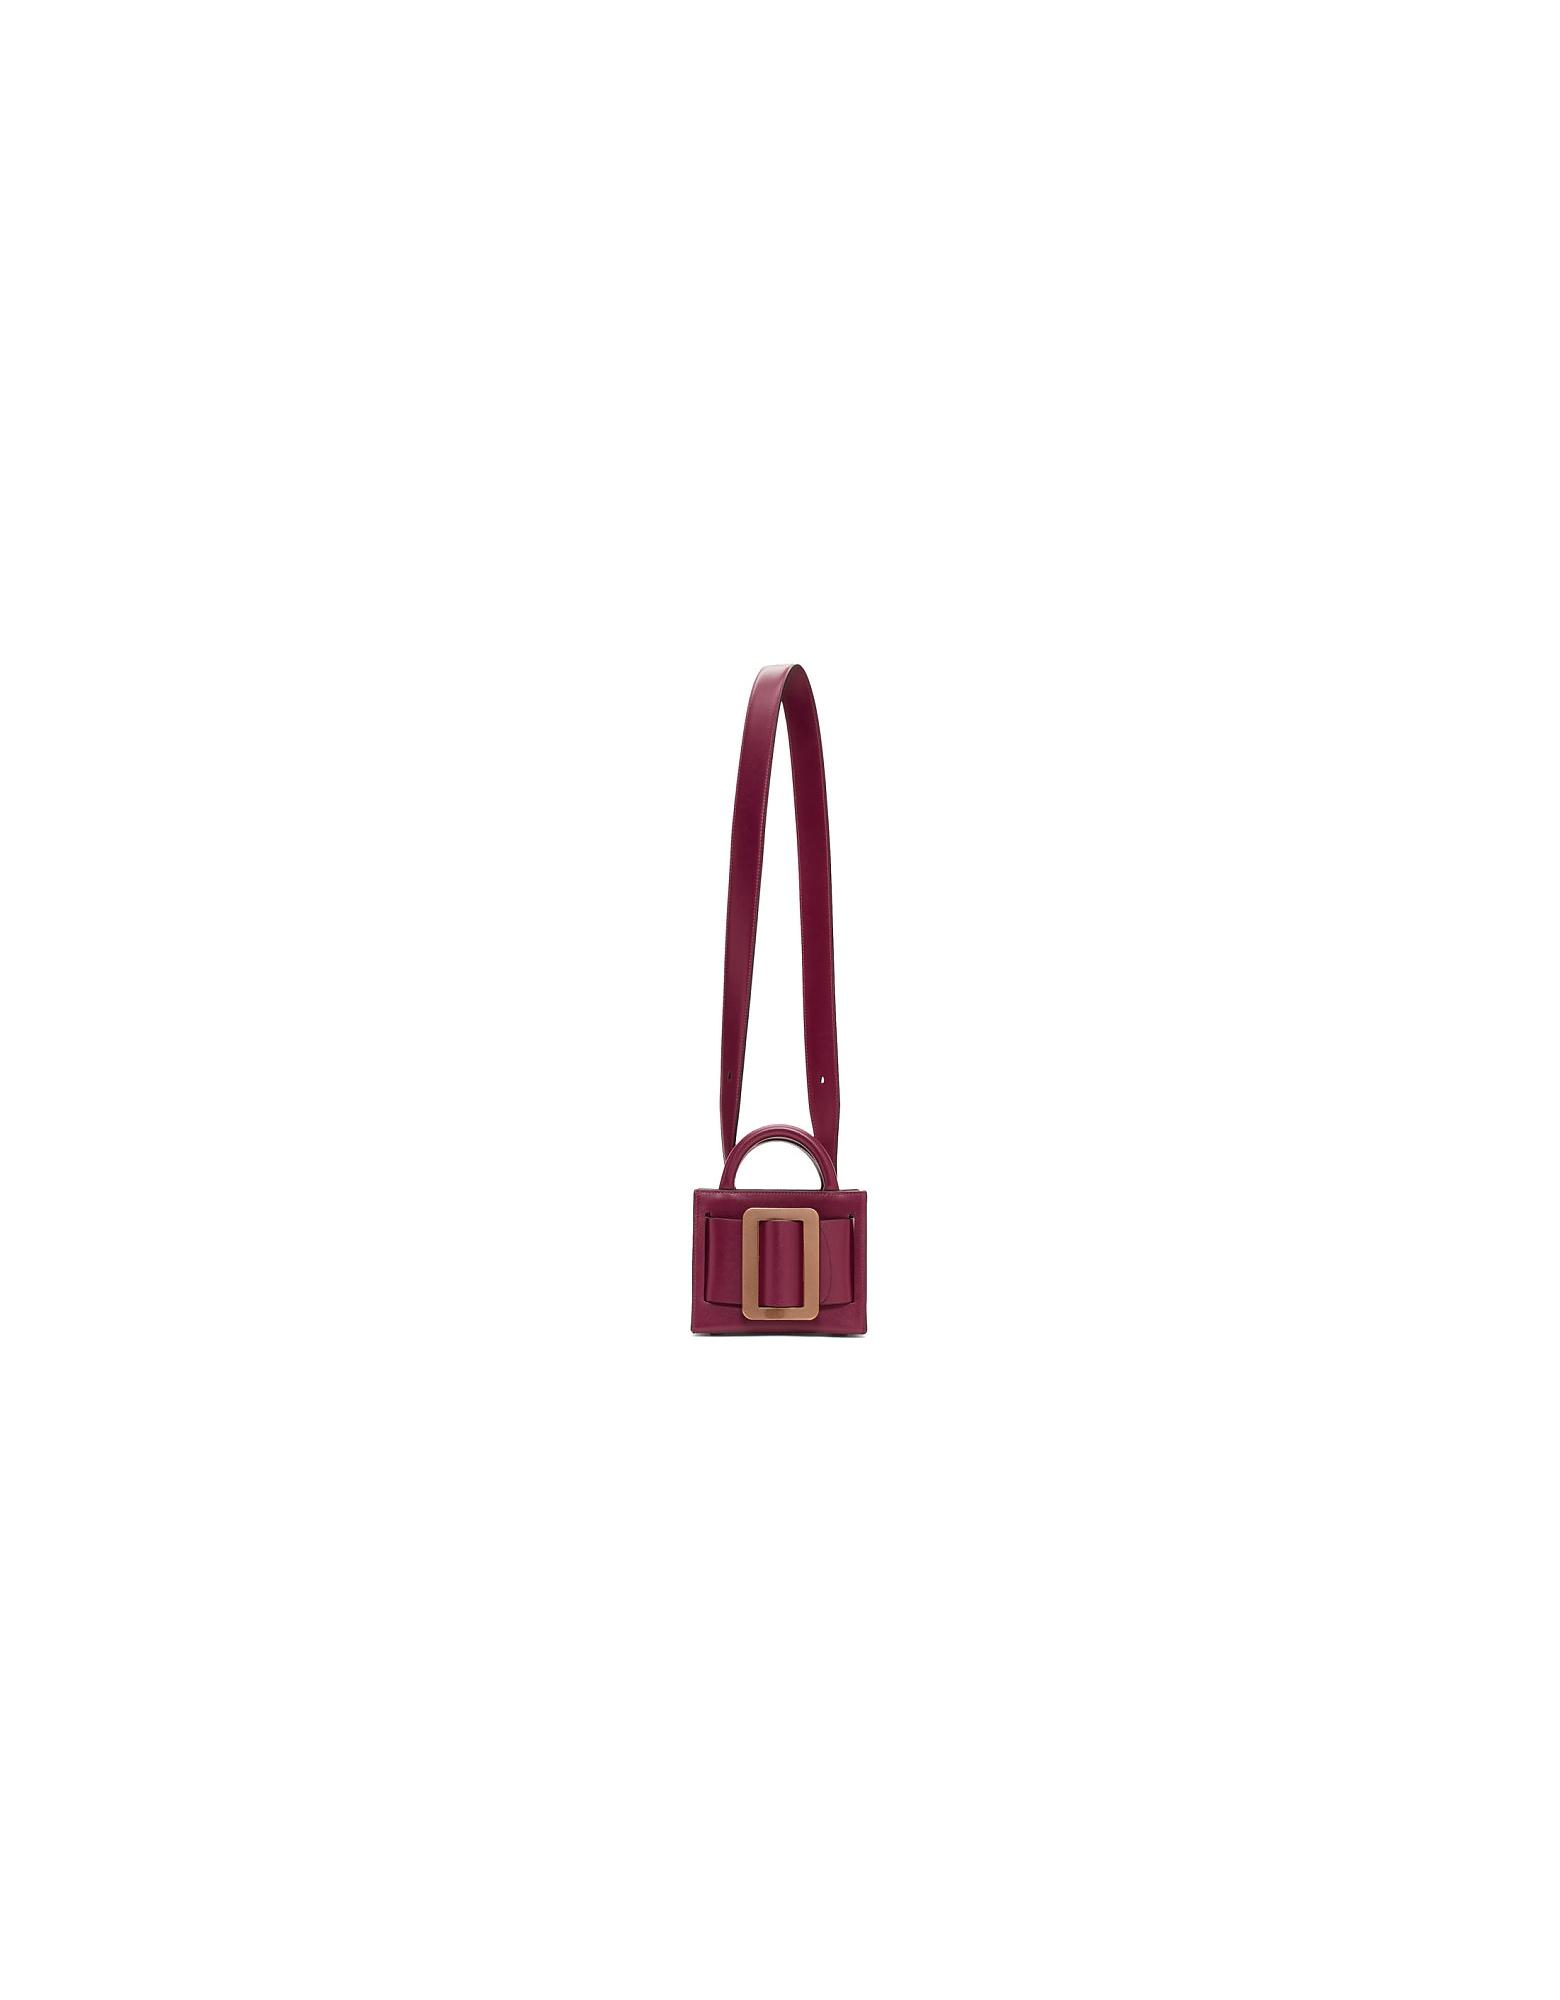 BOYY Designer Handbags, Purple Bobby 16 Bag